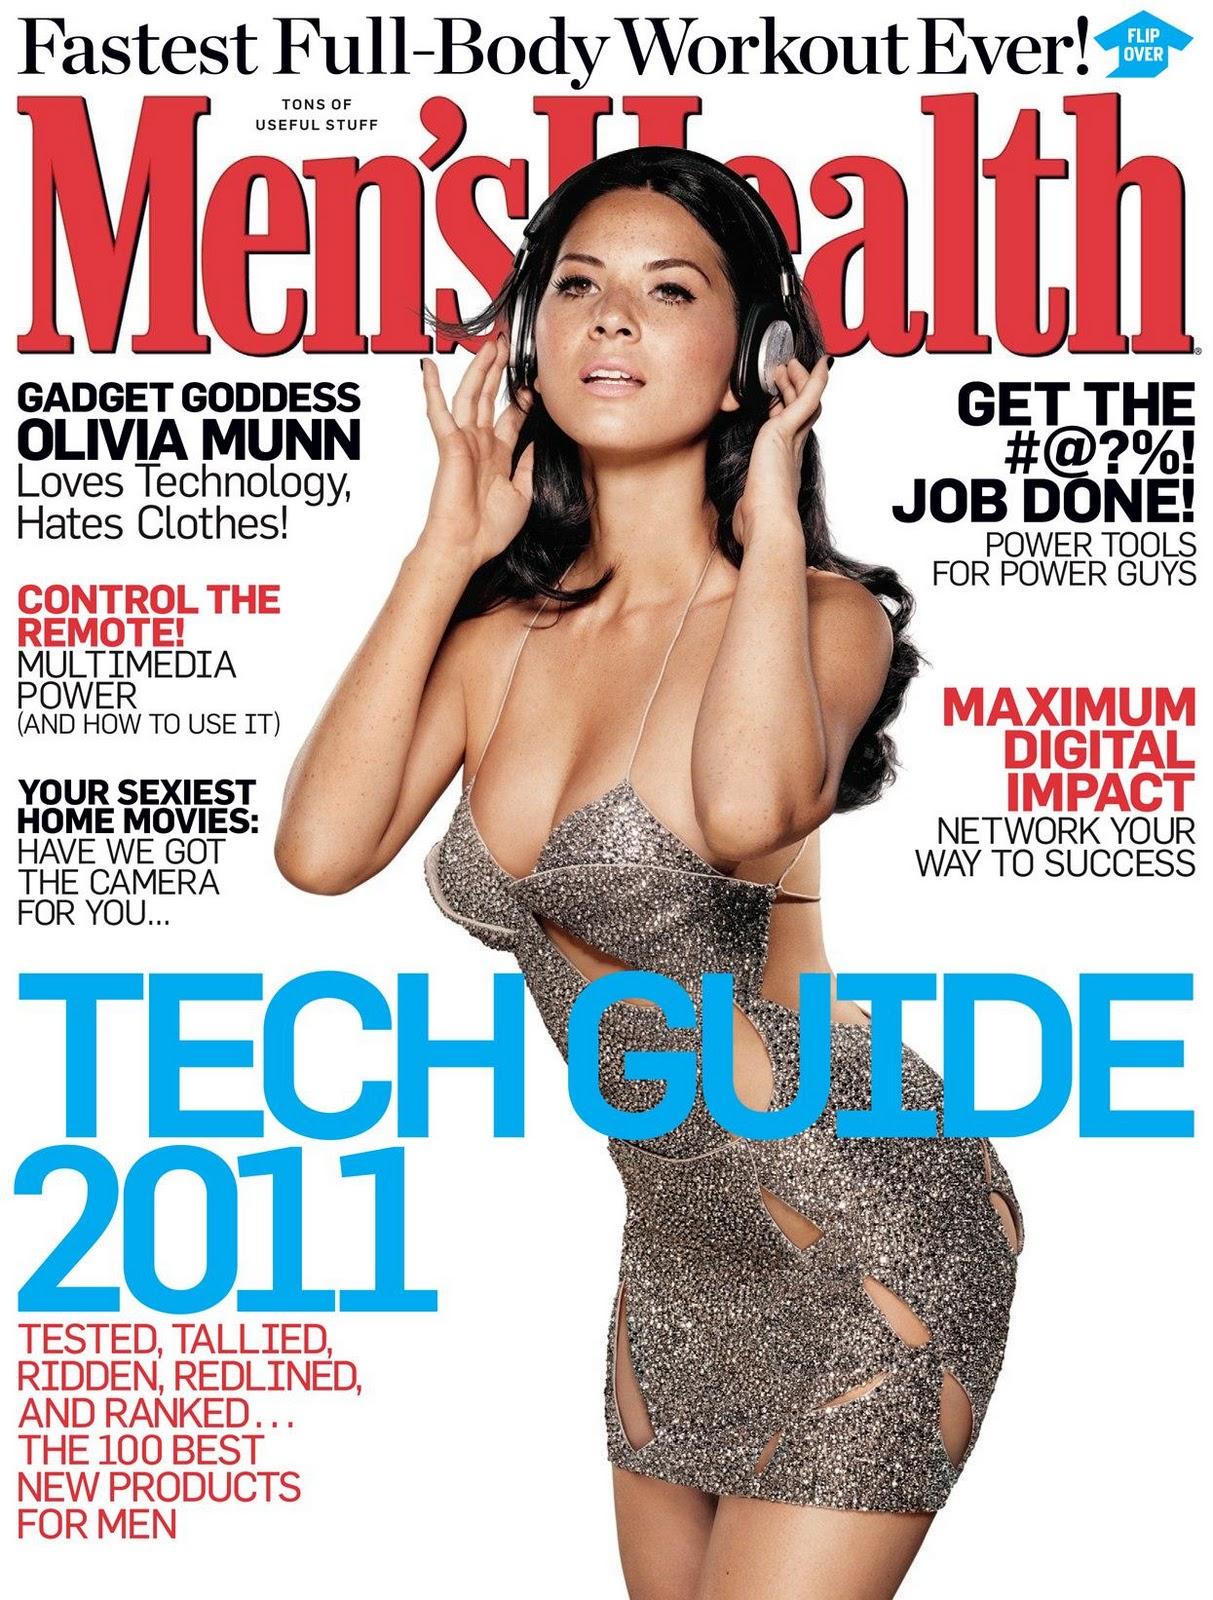 http://3.bp.blogspot.com/_QcYf_8sBCik/TRqlX-AVPwI/AAAAAAAAH1Q/poZi7u3LRyY/s1600/Olivia+Munn+Men%2527s+Health+Tech+Guide+2011.jpg